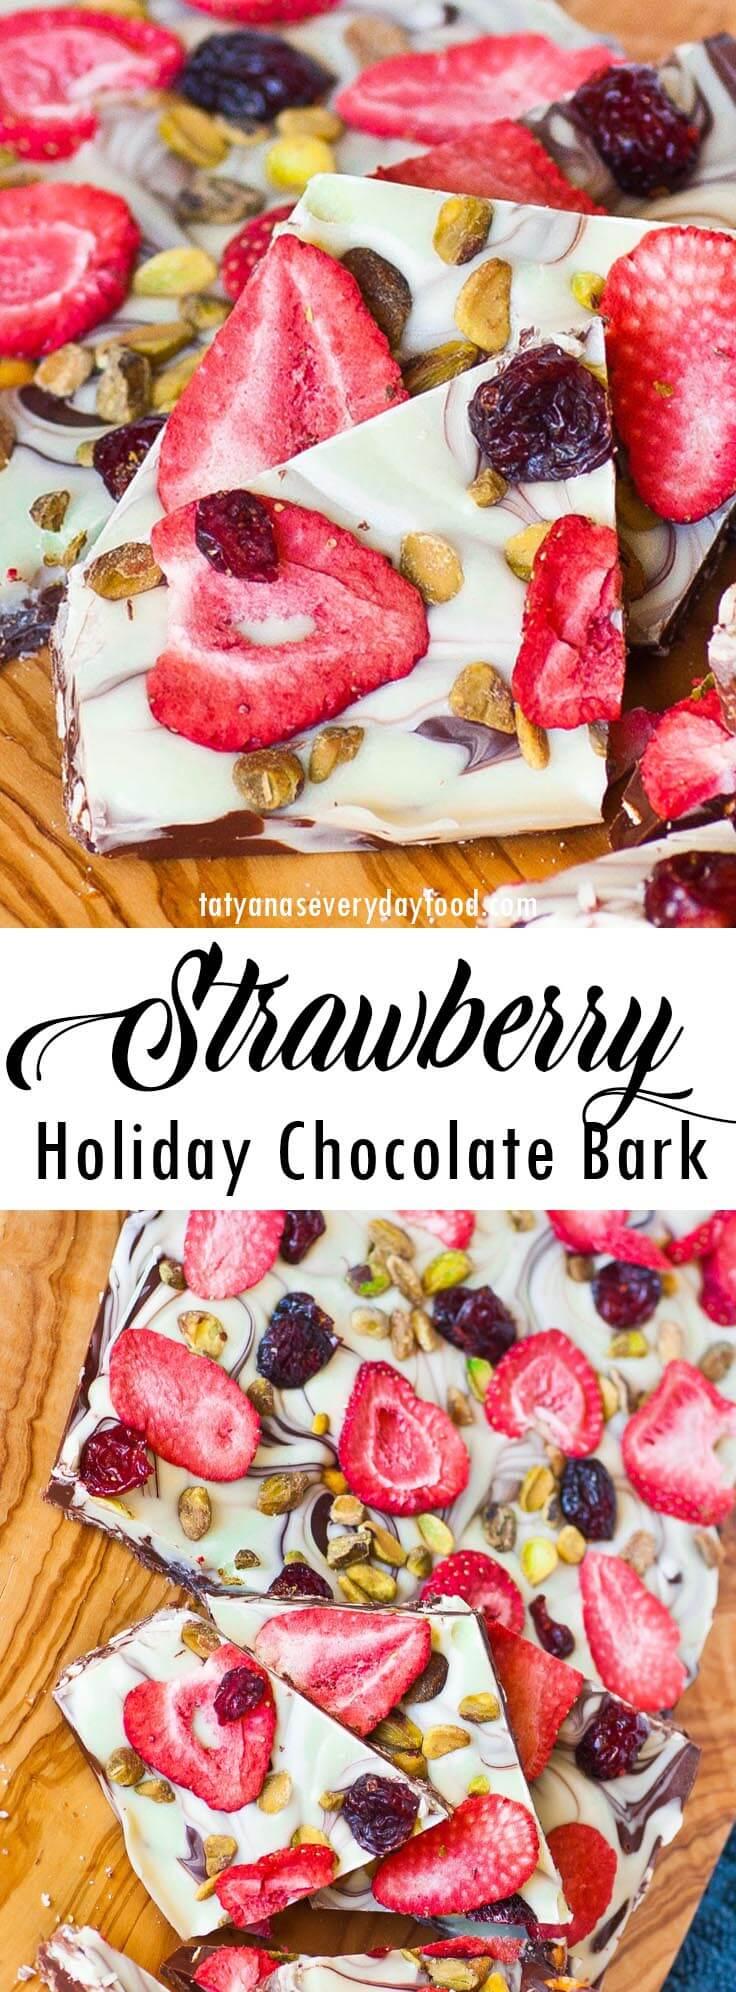 Holiday Chocolate Bark video recipe